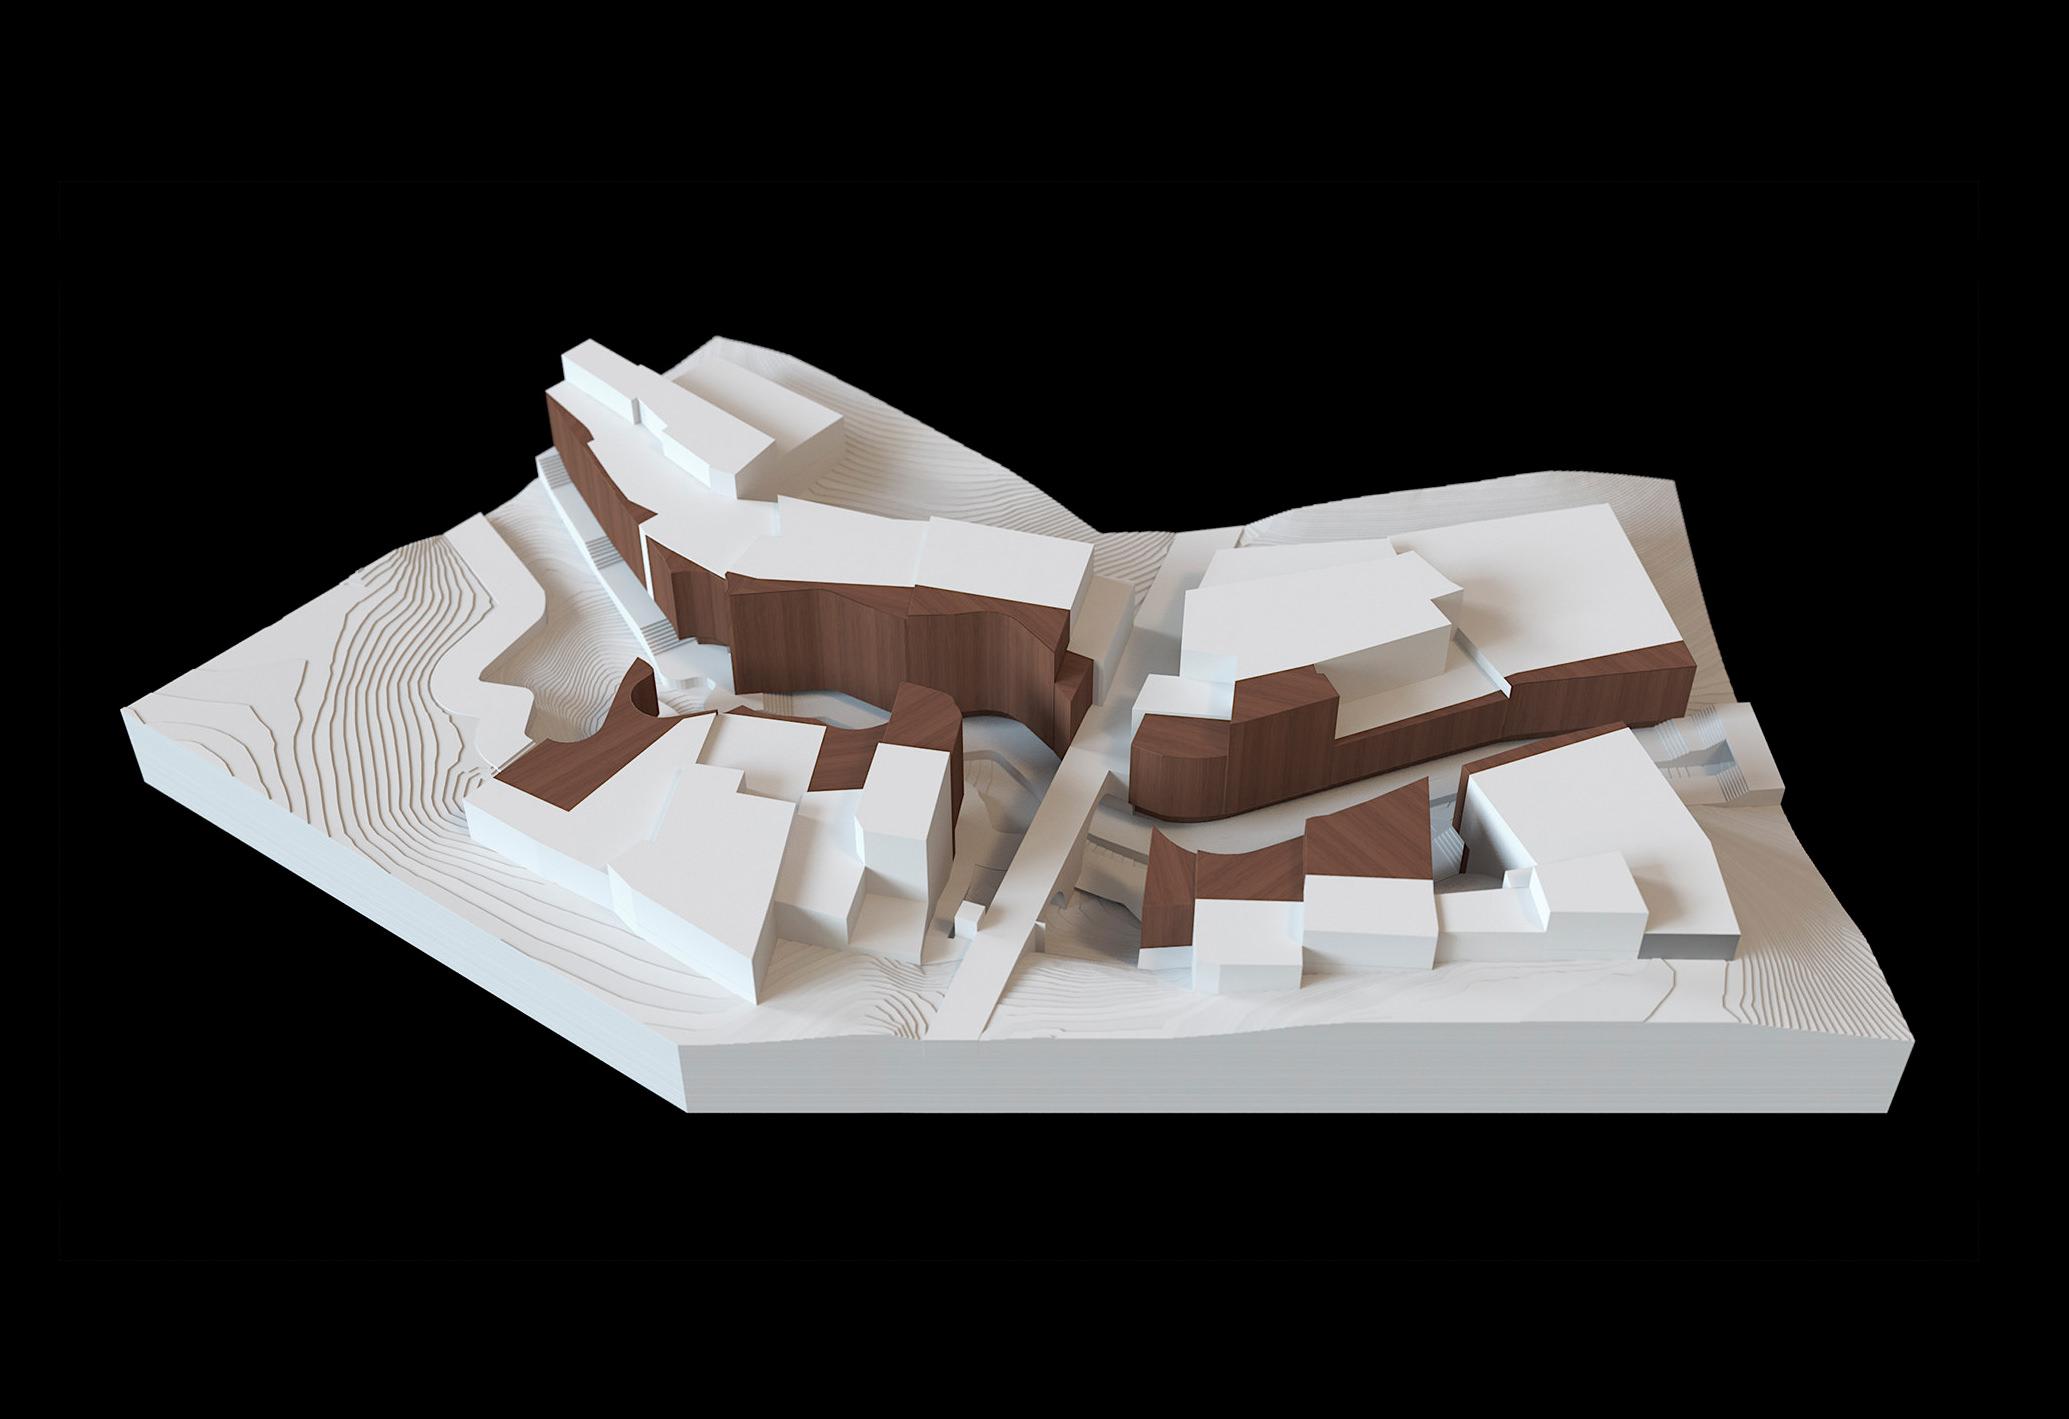 place-lalla-yeddouna-model3-joerg-hugo copy.jpg